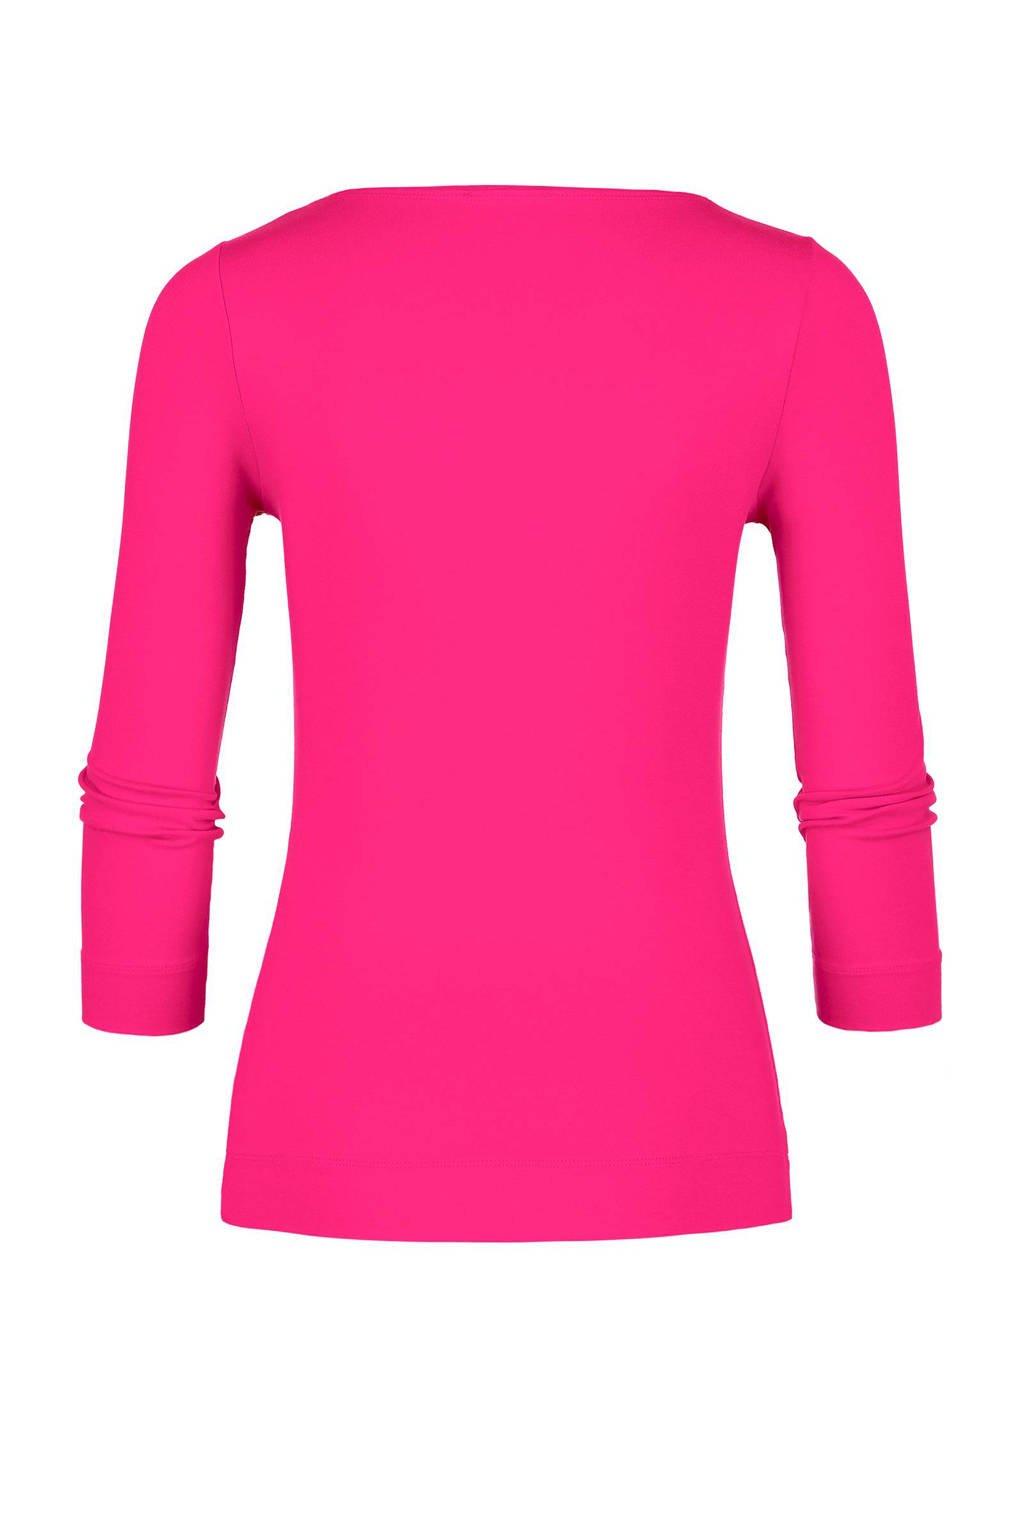 Claudia Sträter T-shirt, Fuchsia